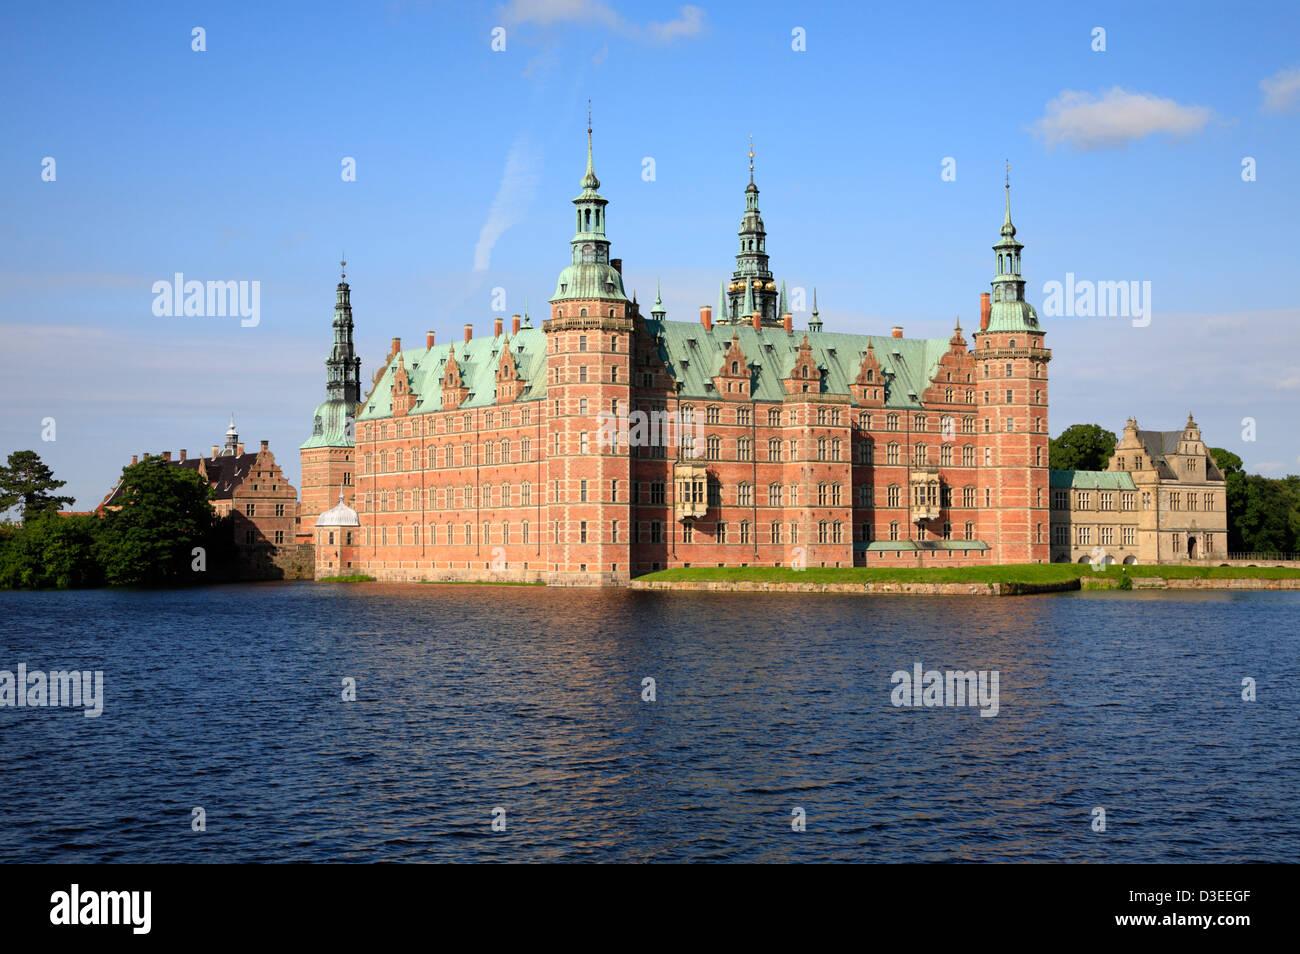 The Frederiksborg Castle in in Dutch Renaissance style in Hillerød (Hilleroed or Hillerod) near Copenhagen, - Stock Image